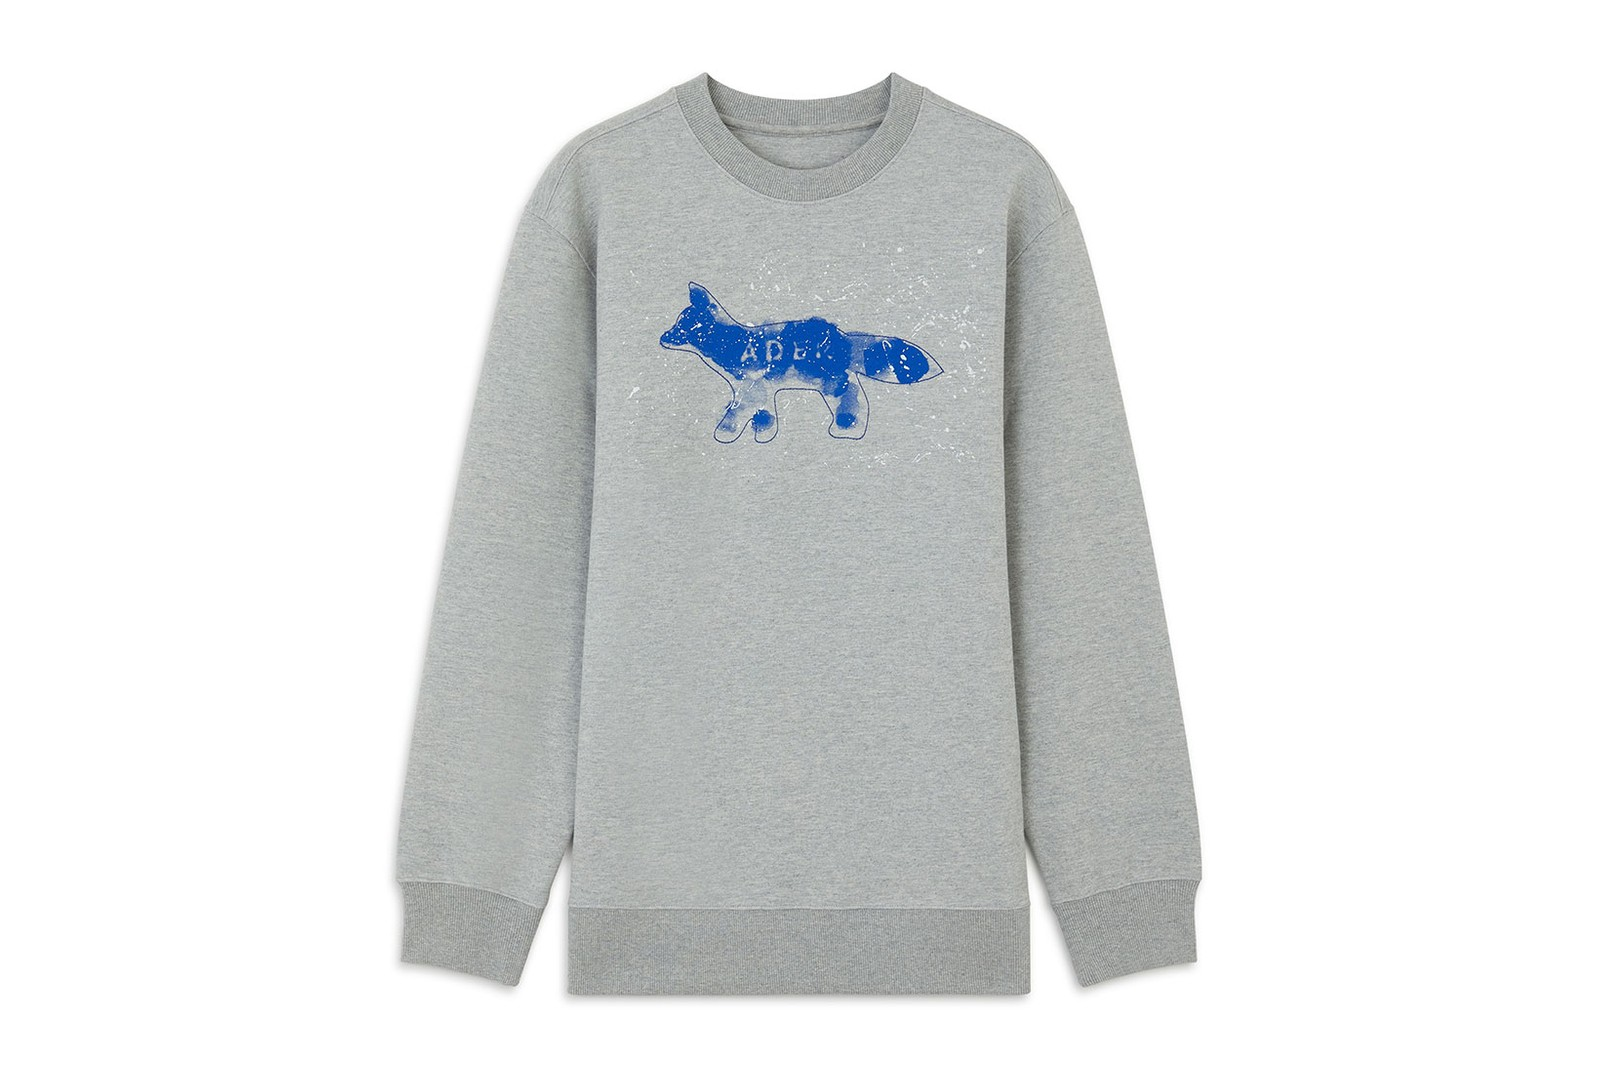 ader error maison kitsune the bluest fox collaboration campaign tees sweatshirts caps jeans